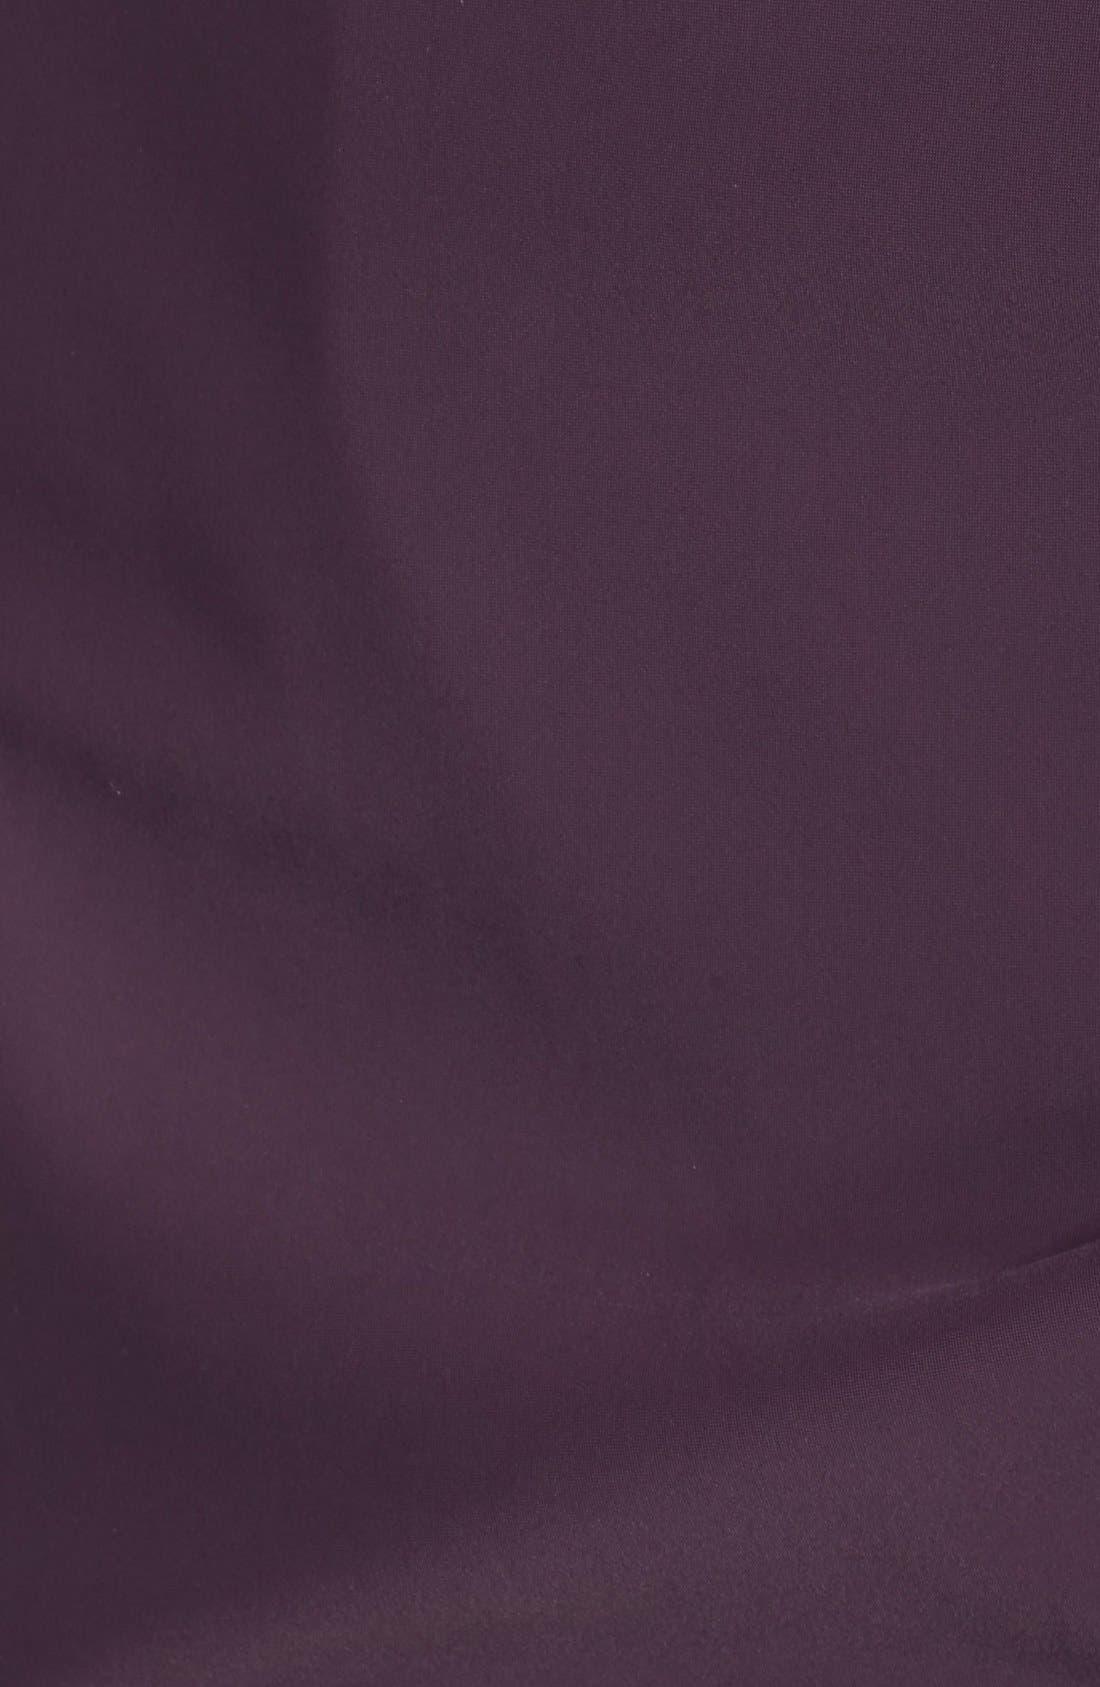 Embellished Surplice Sheath Dress,                             Alternate thumbnail 33, color,